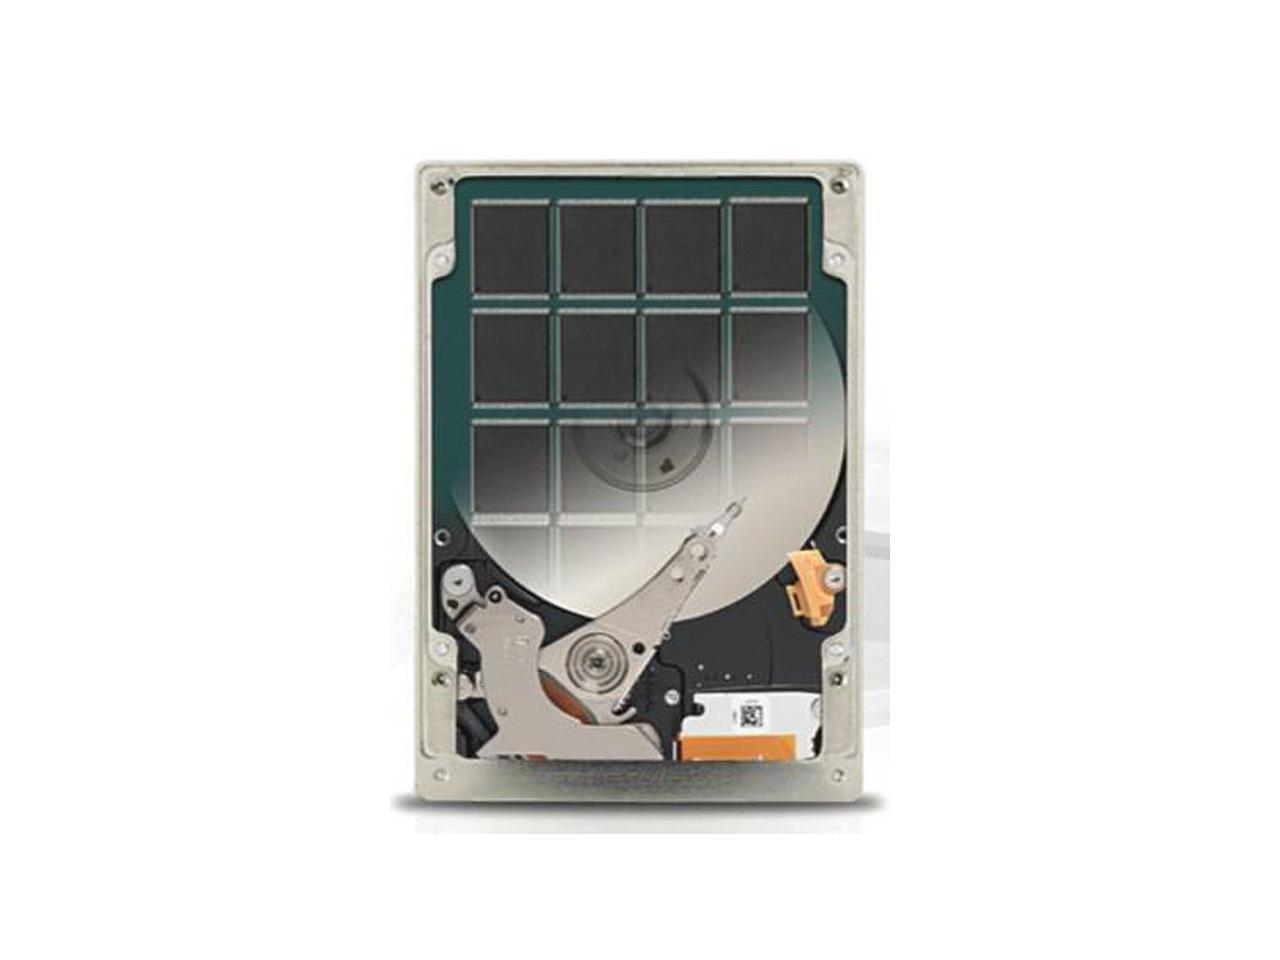 R700 R700 1TB 2.5 Laptop SSHD Solid State Hybrid Drive for Toshiba Tecra R700 PT319C-008001 PT319C-00E002 PT319C-00D002 R700 PT319C-007001